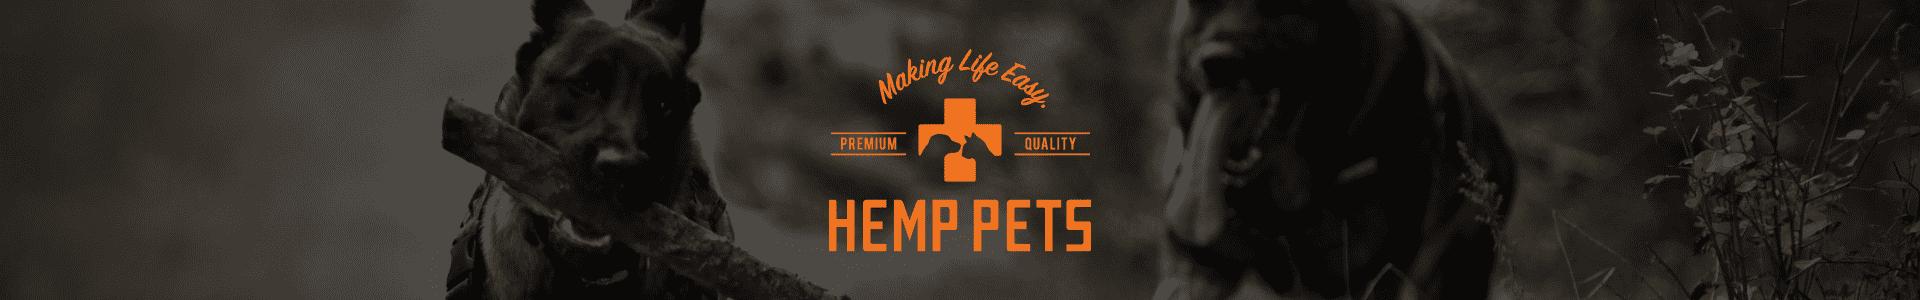 Buy Hemp Pets CBD Online